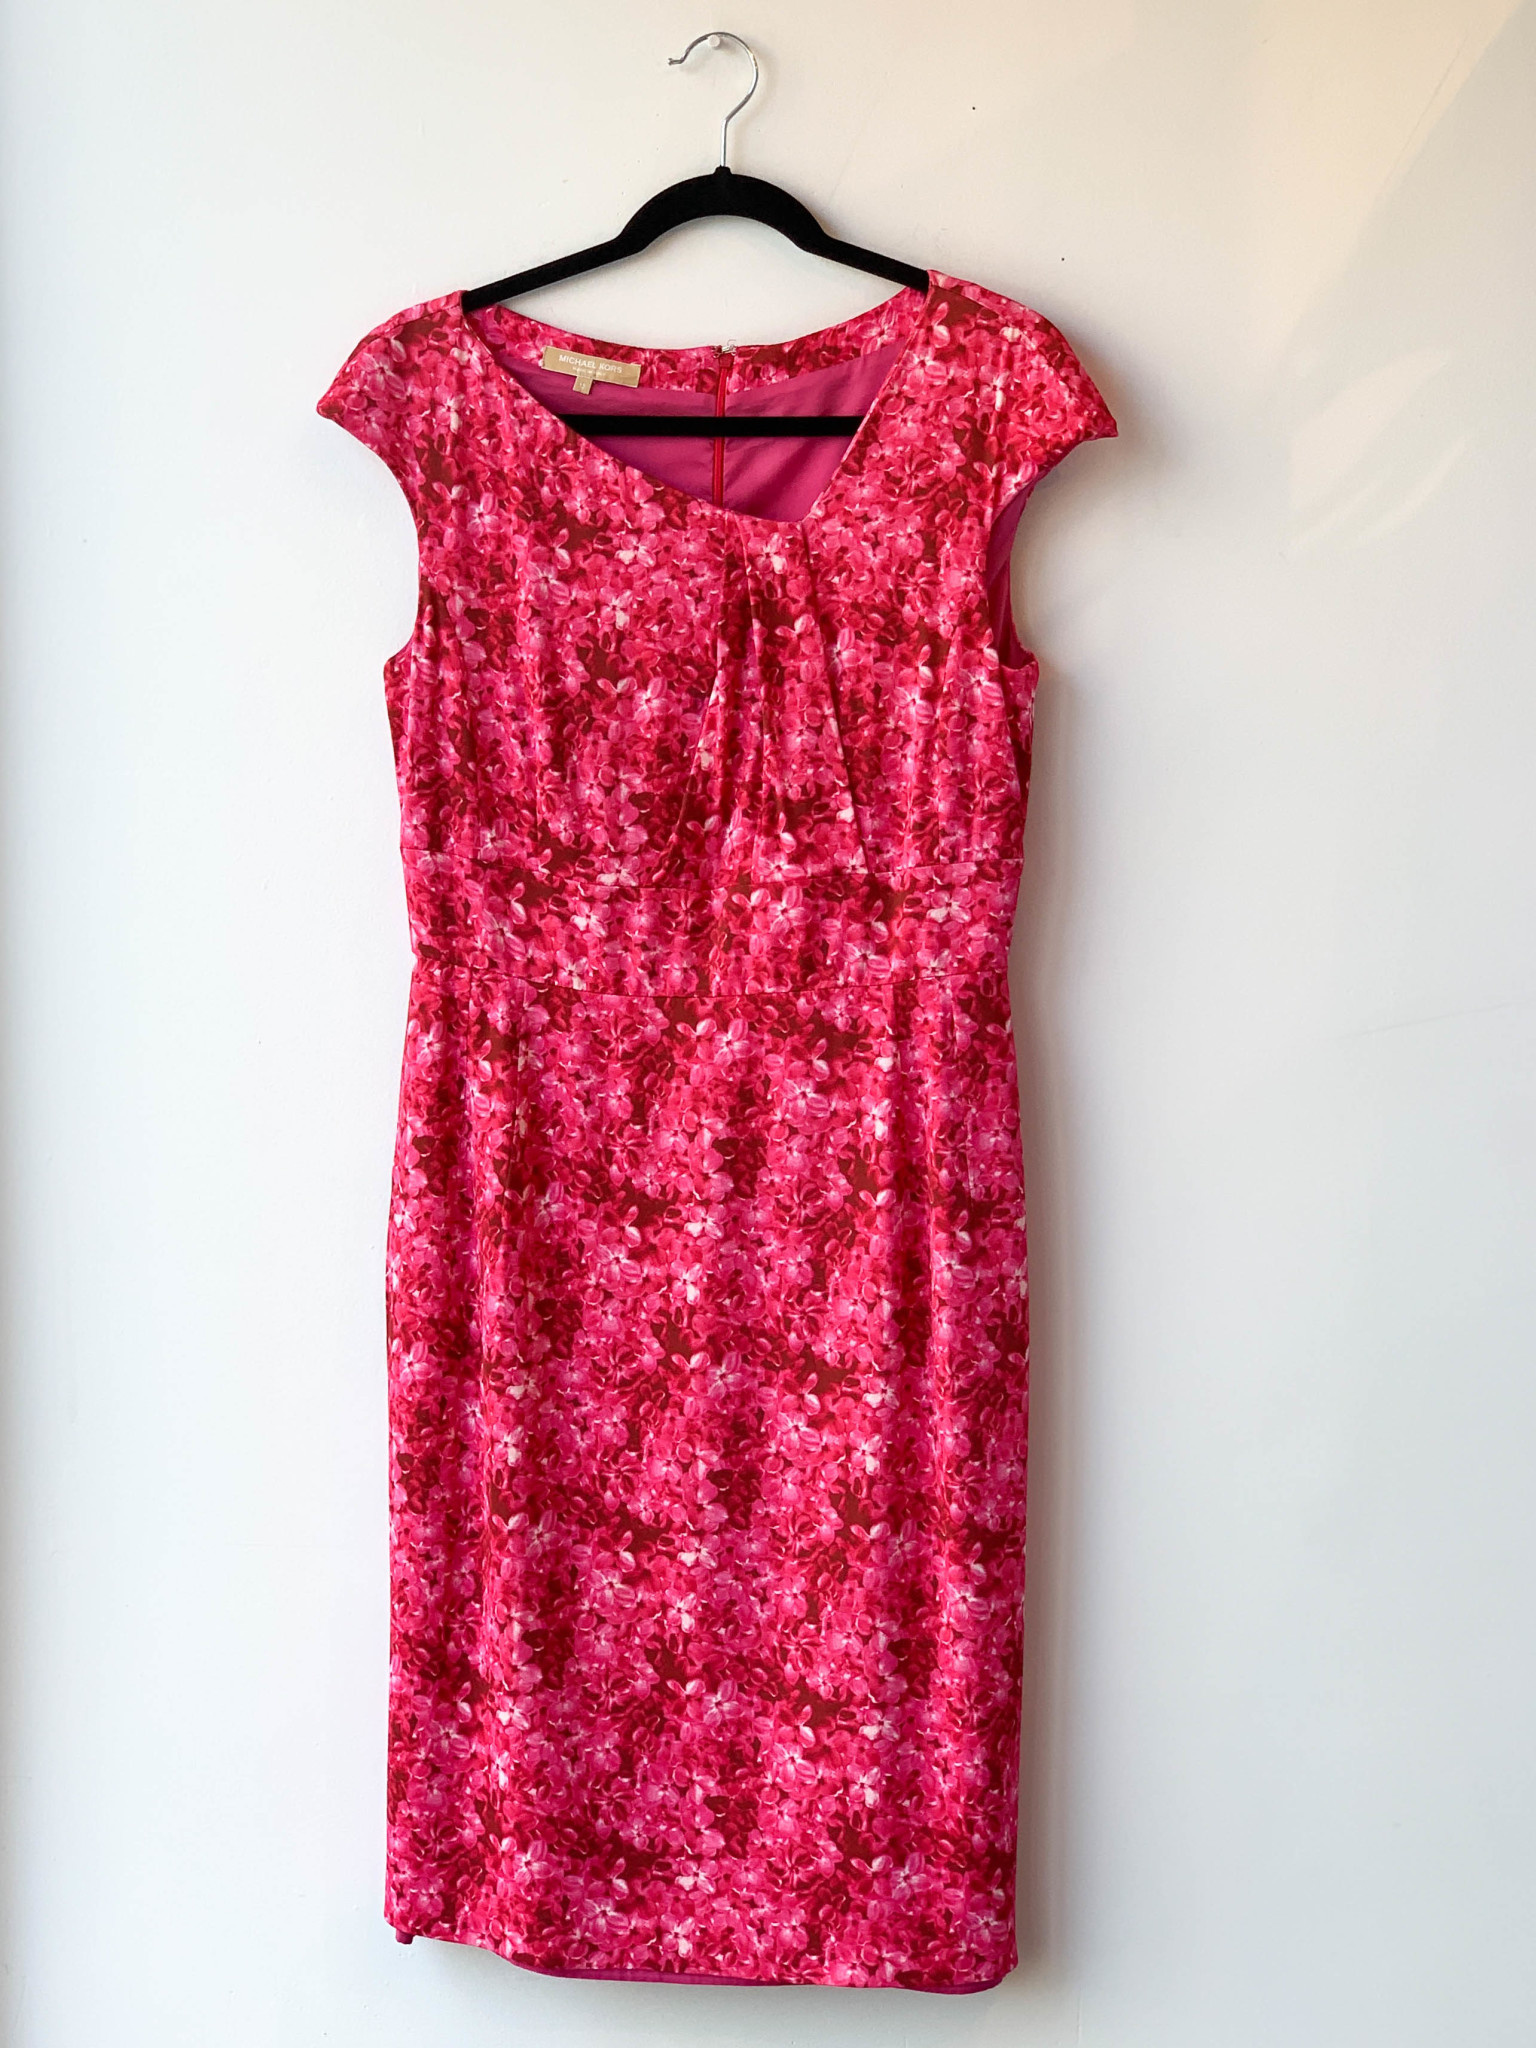 Michael Kors PINK FLORAL DRESS